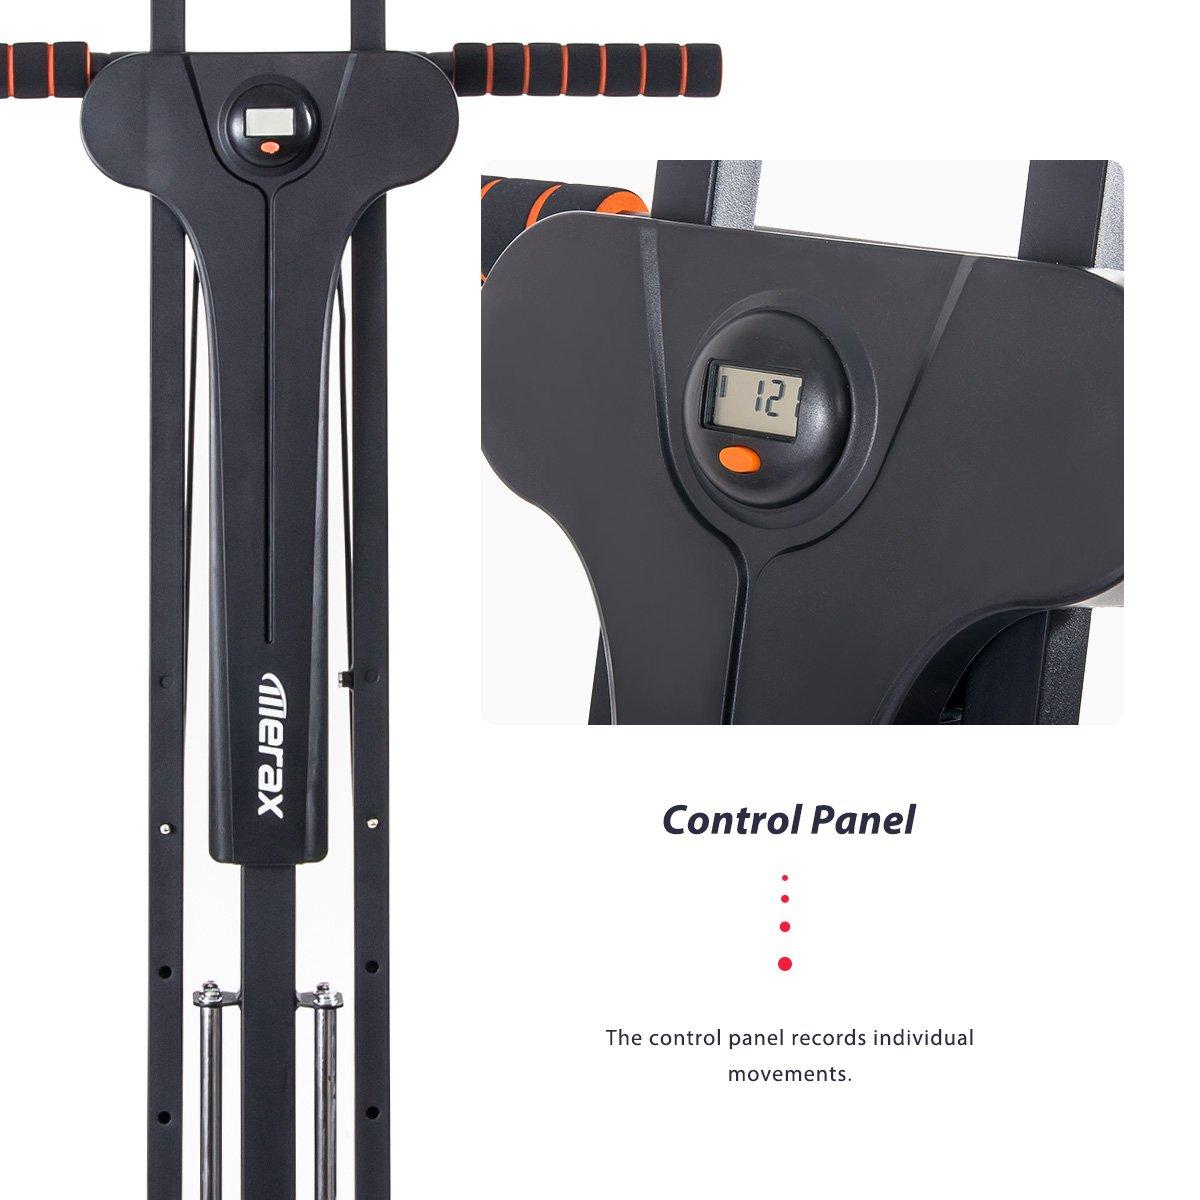 Merax Vertical Climber Fitness Climbing Cardio Machine Full Total Body Workout Fitness Folding Climber 2.0 (Black) by Merax (Image #5)